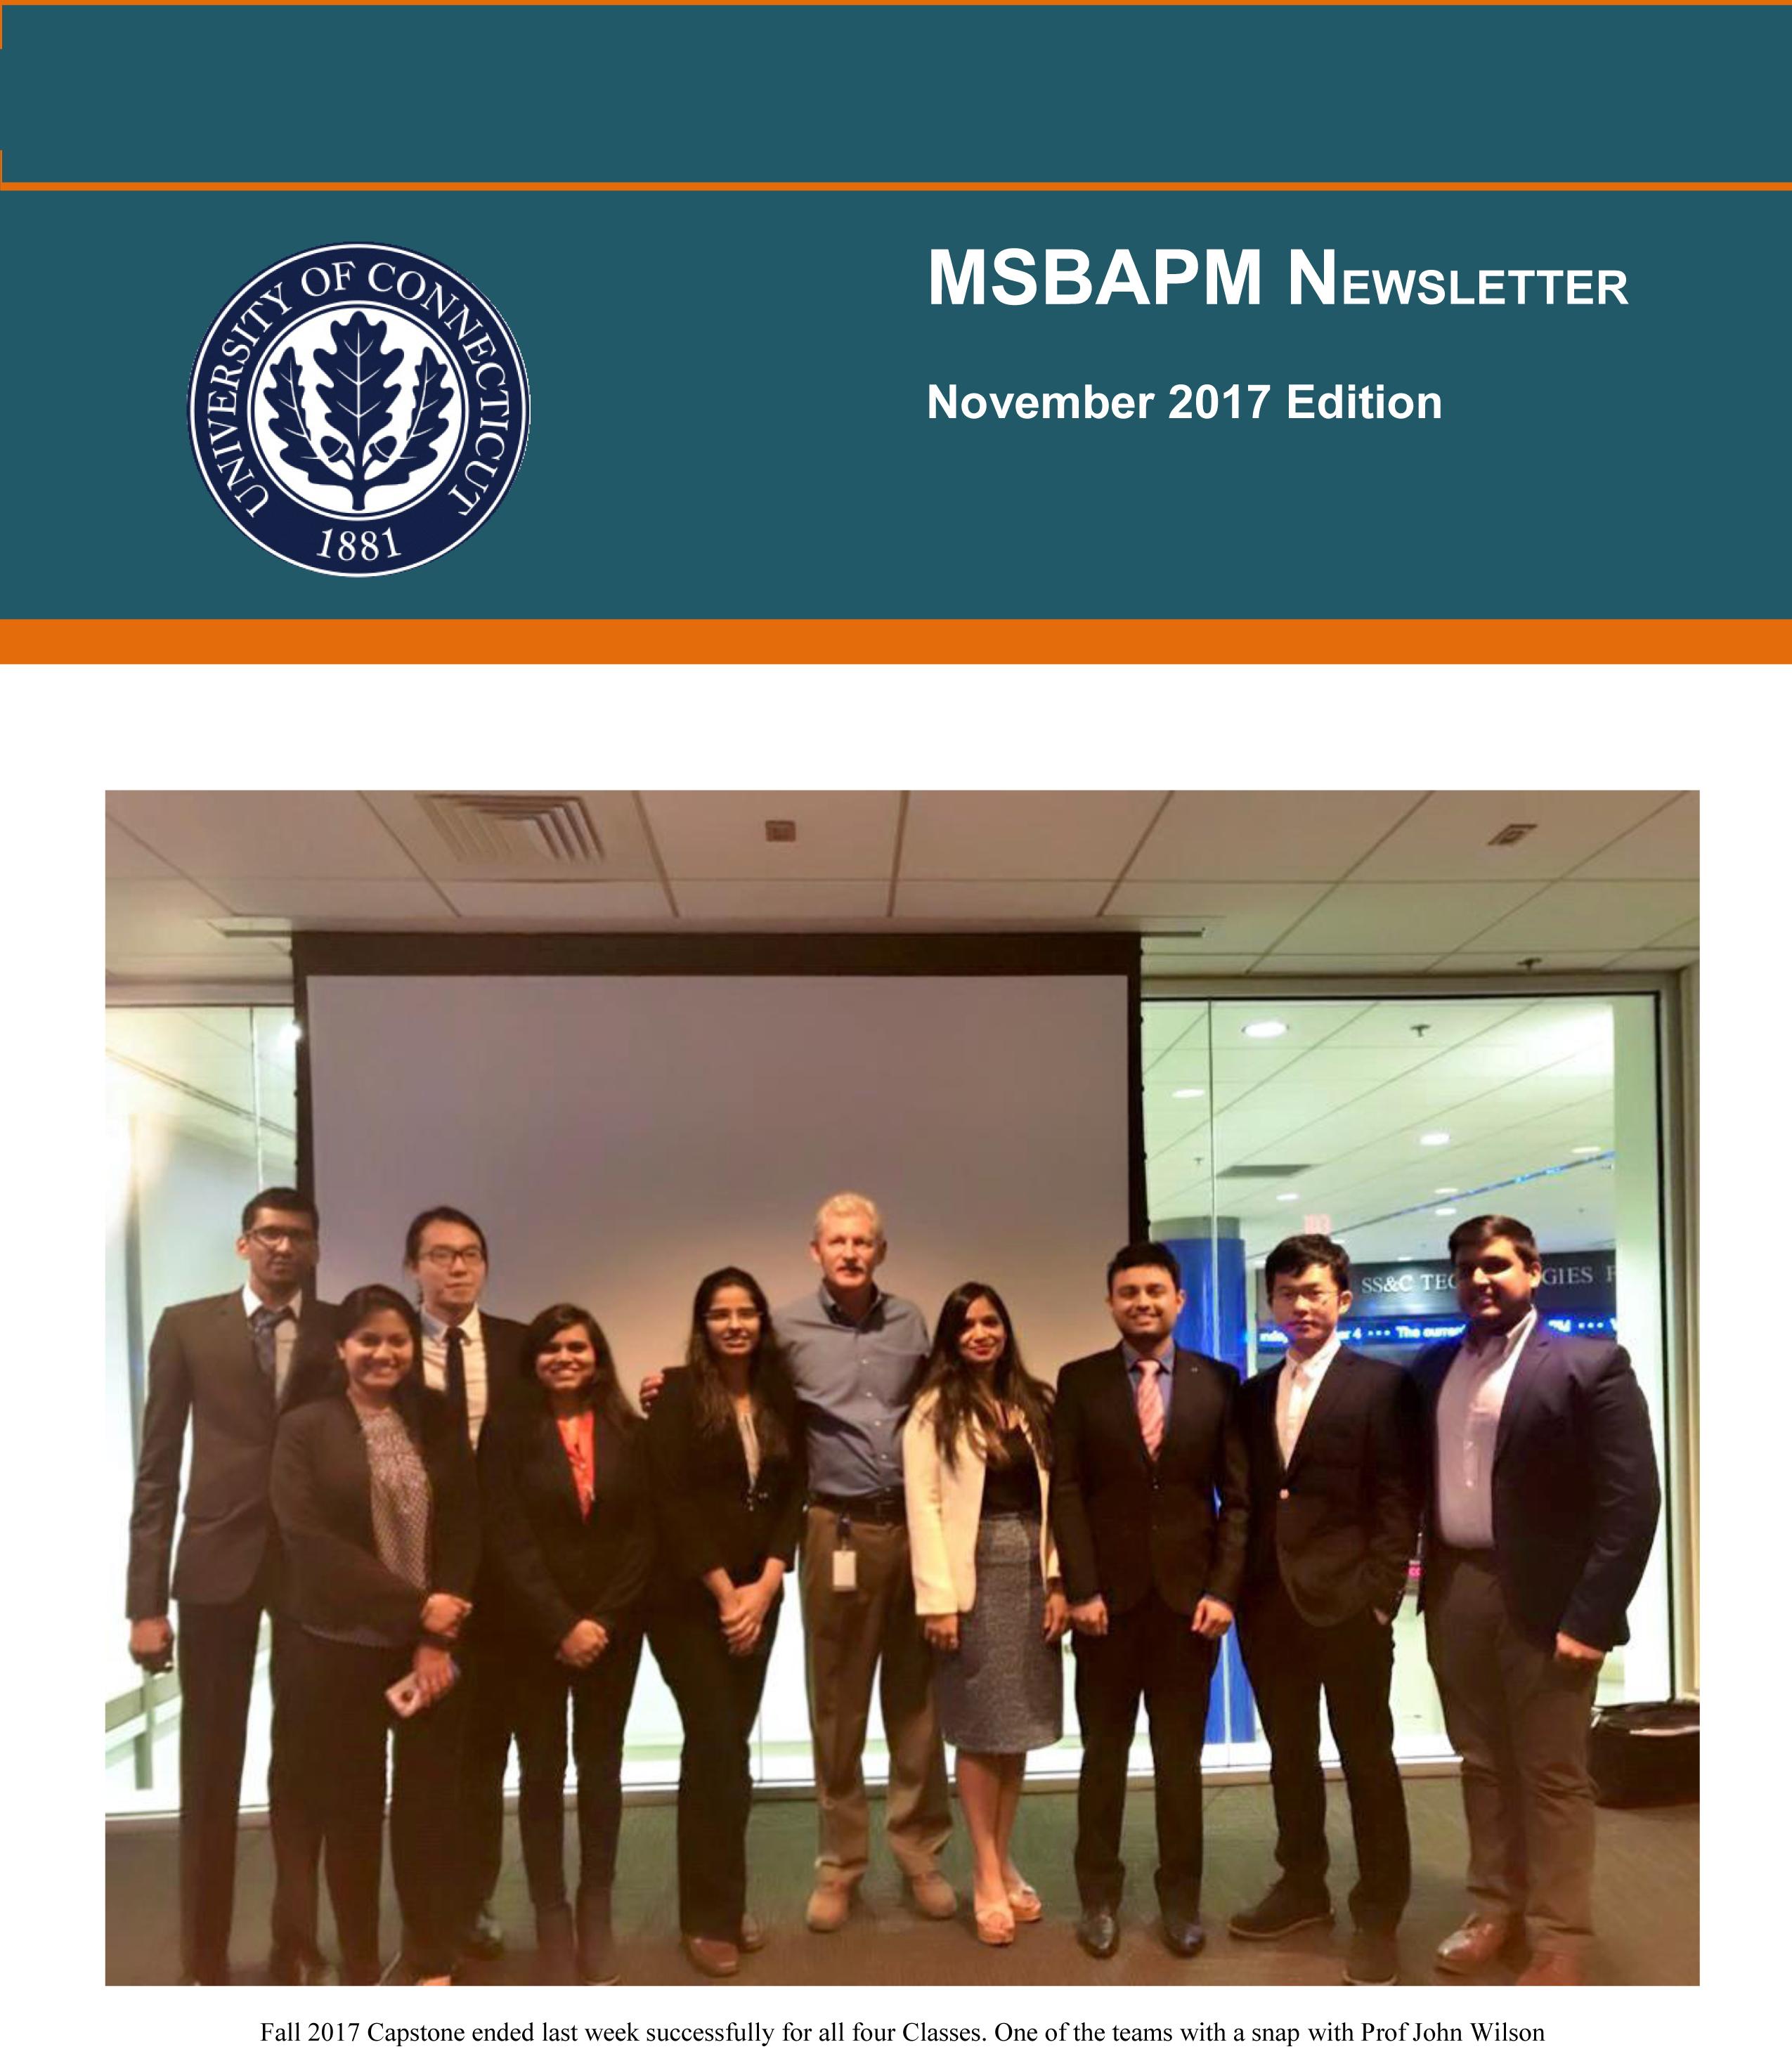 MSBAPM November 2017 Newsletter